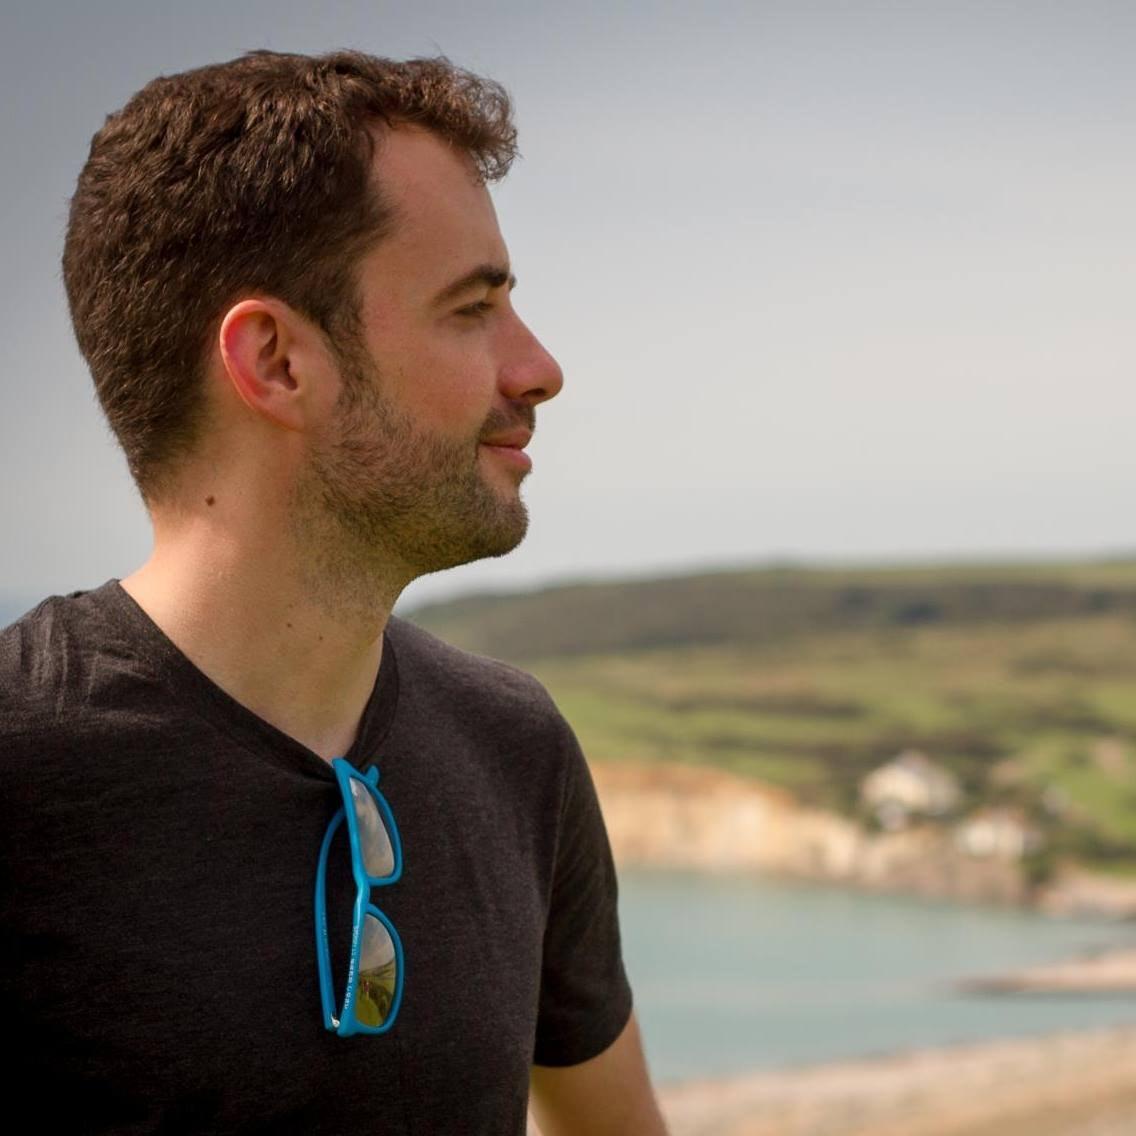 A profile photograph of Jamie McHale